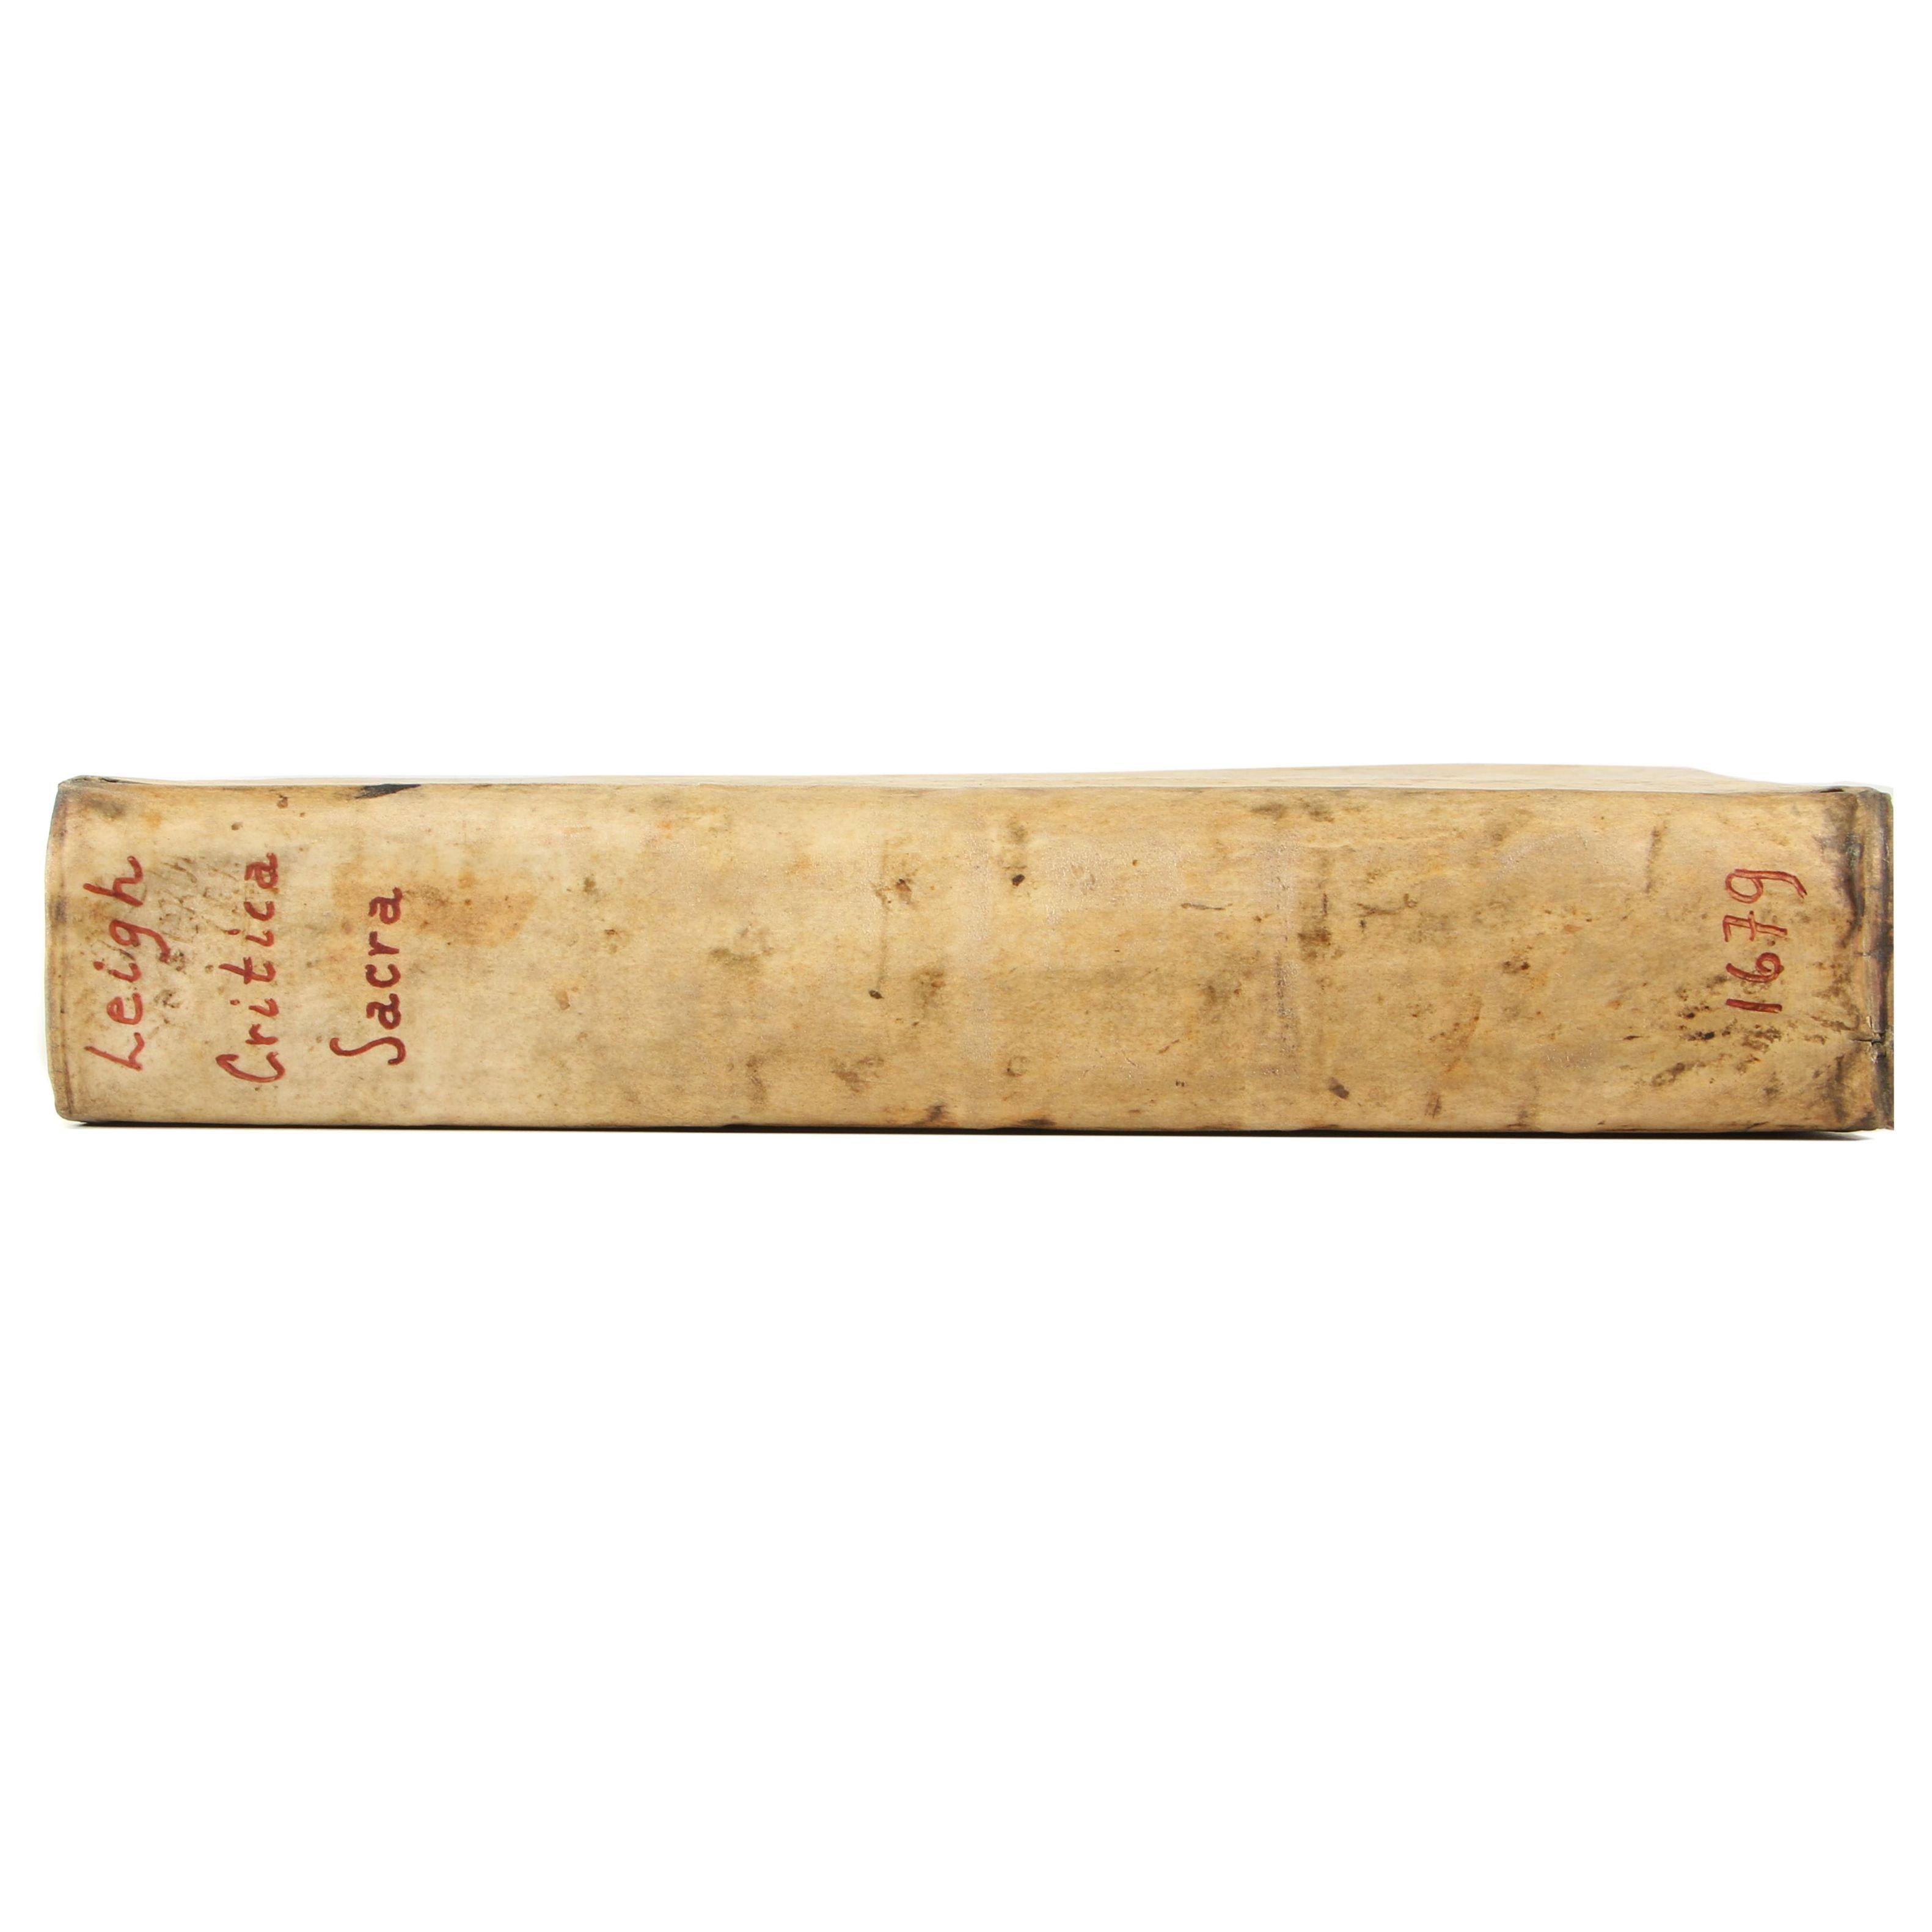 "Latin-Translated ""Critica Sacra"" by Edward Leigh, 1679"